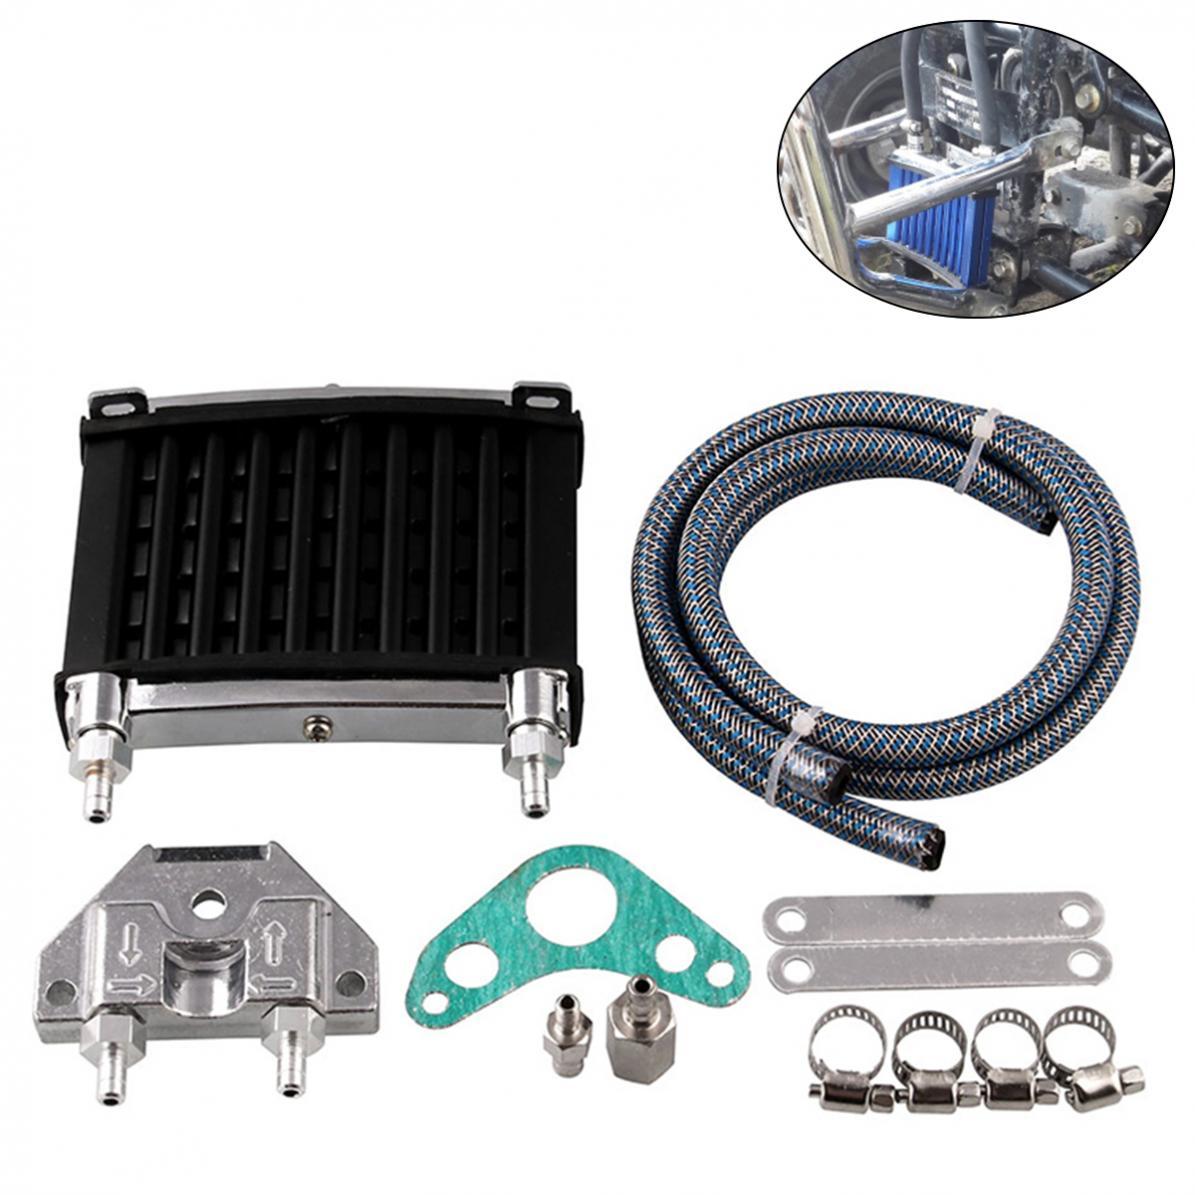 PIT Bike /& Motorcycle CNC Engine Oil Cooling//Radiator Kit Prolong Engine Life